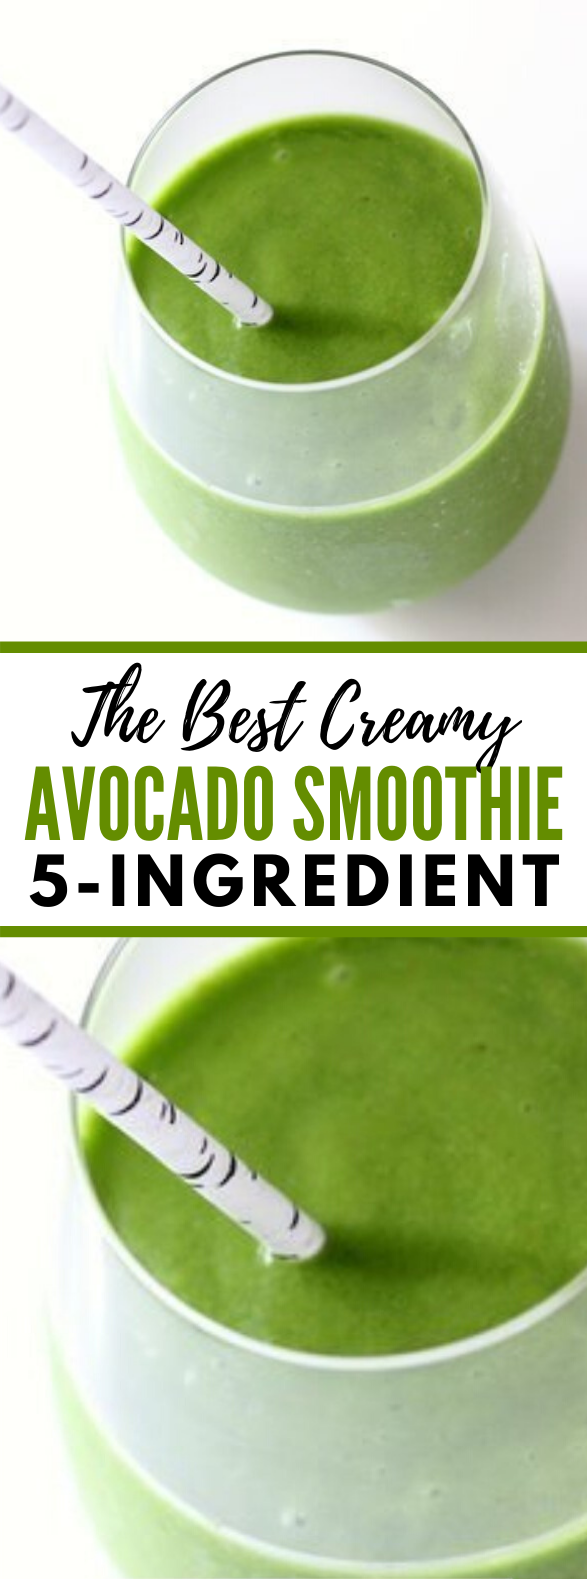 The Best Creamy Avocado Smoothie – 5 Ingredients #healthydrink #breakfast